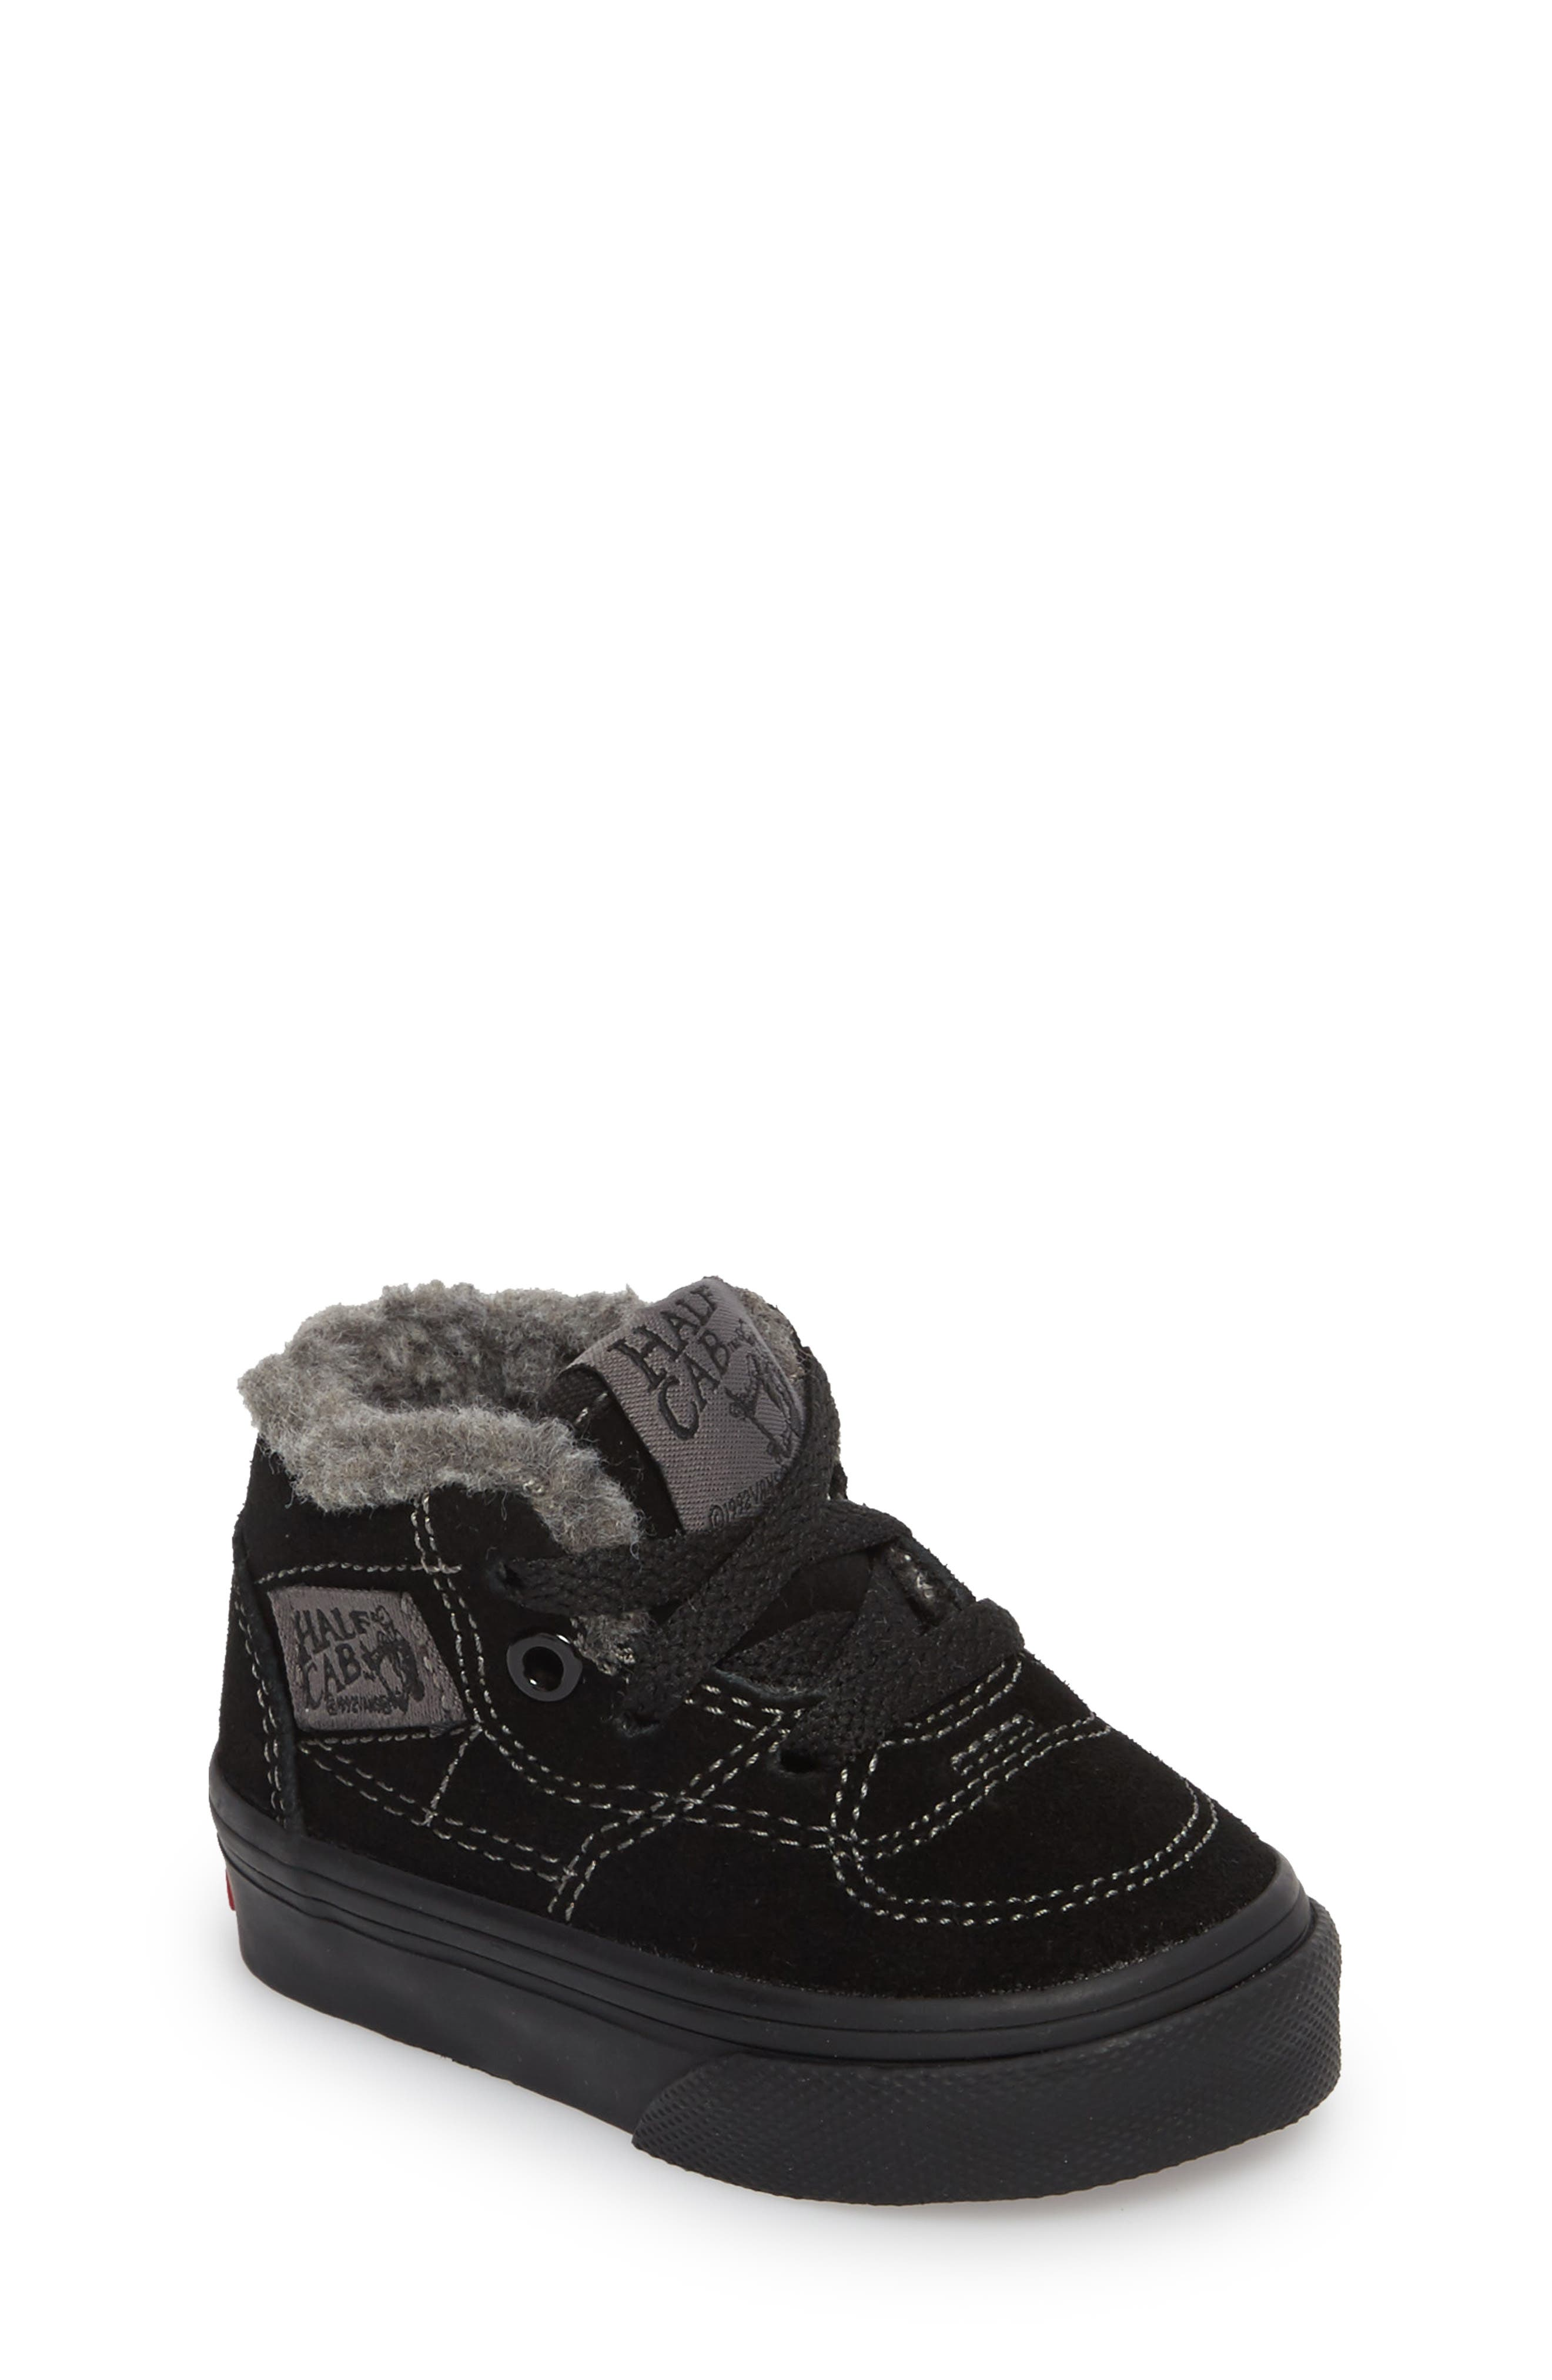 Main Image - Vans Half Cab Sneaker (Baby, Walker & Toddler)